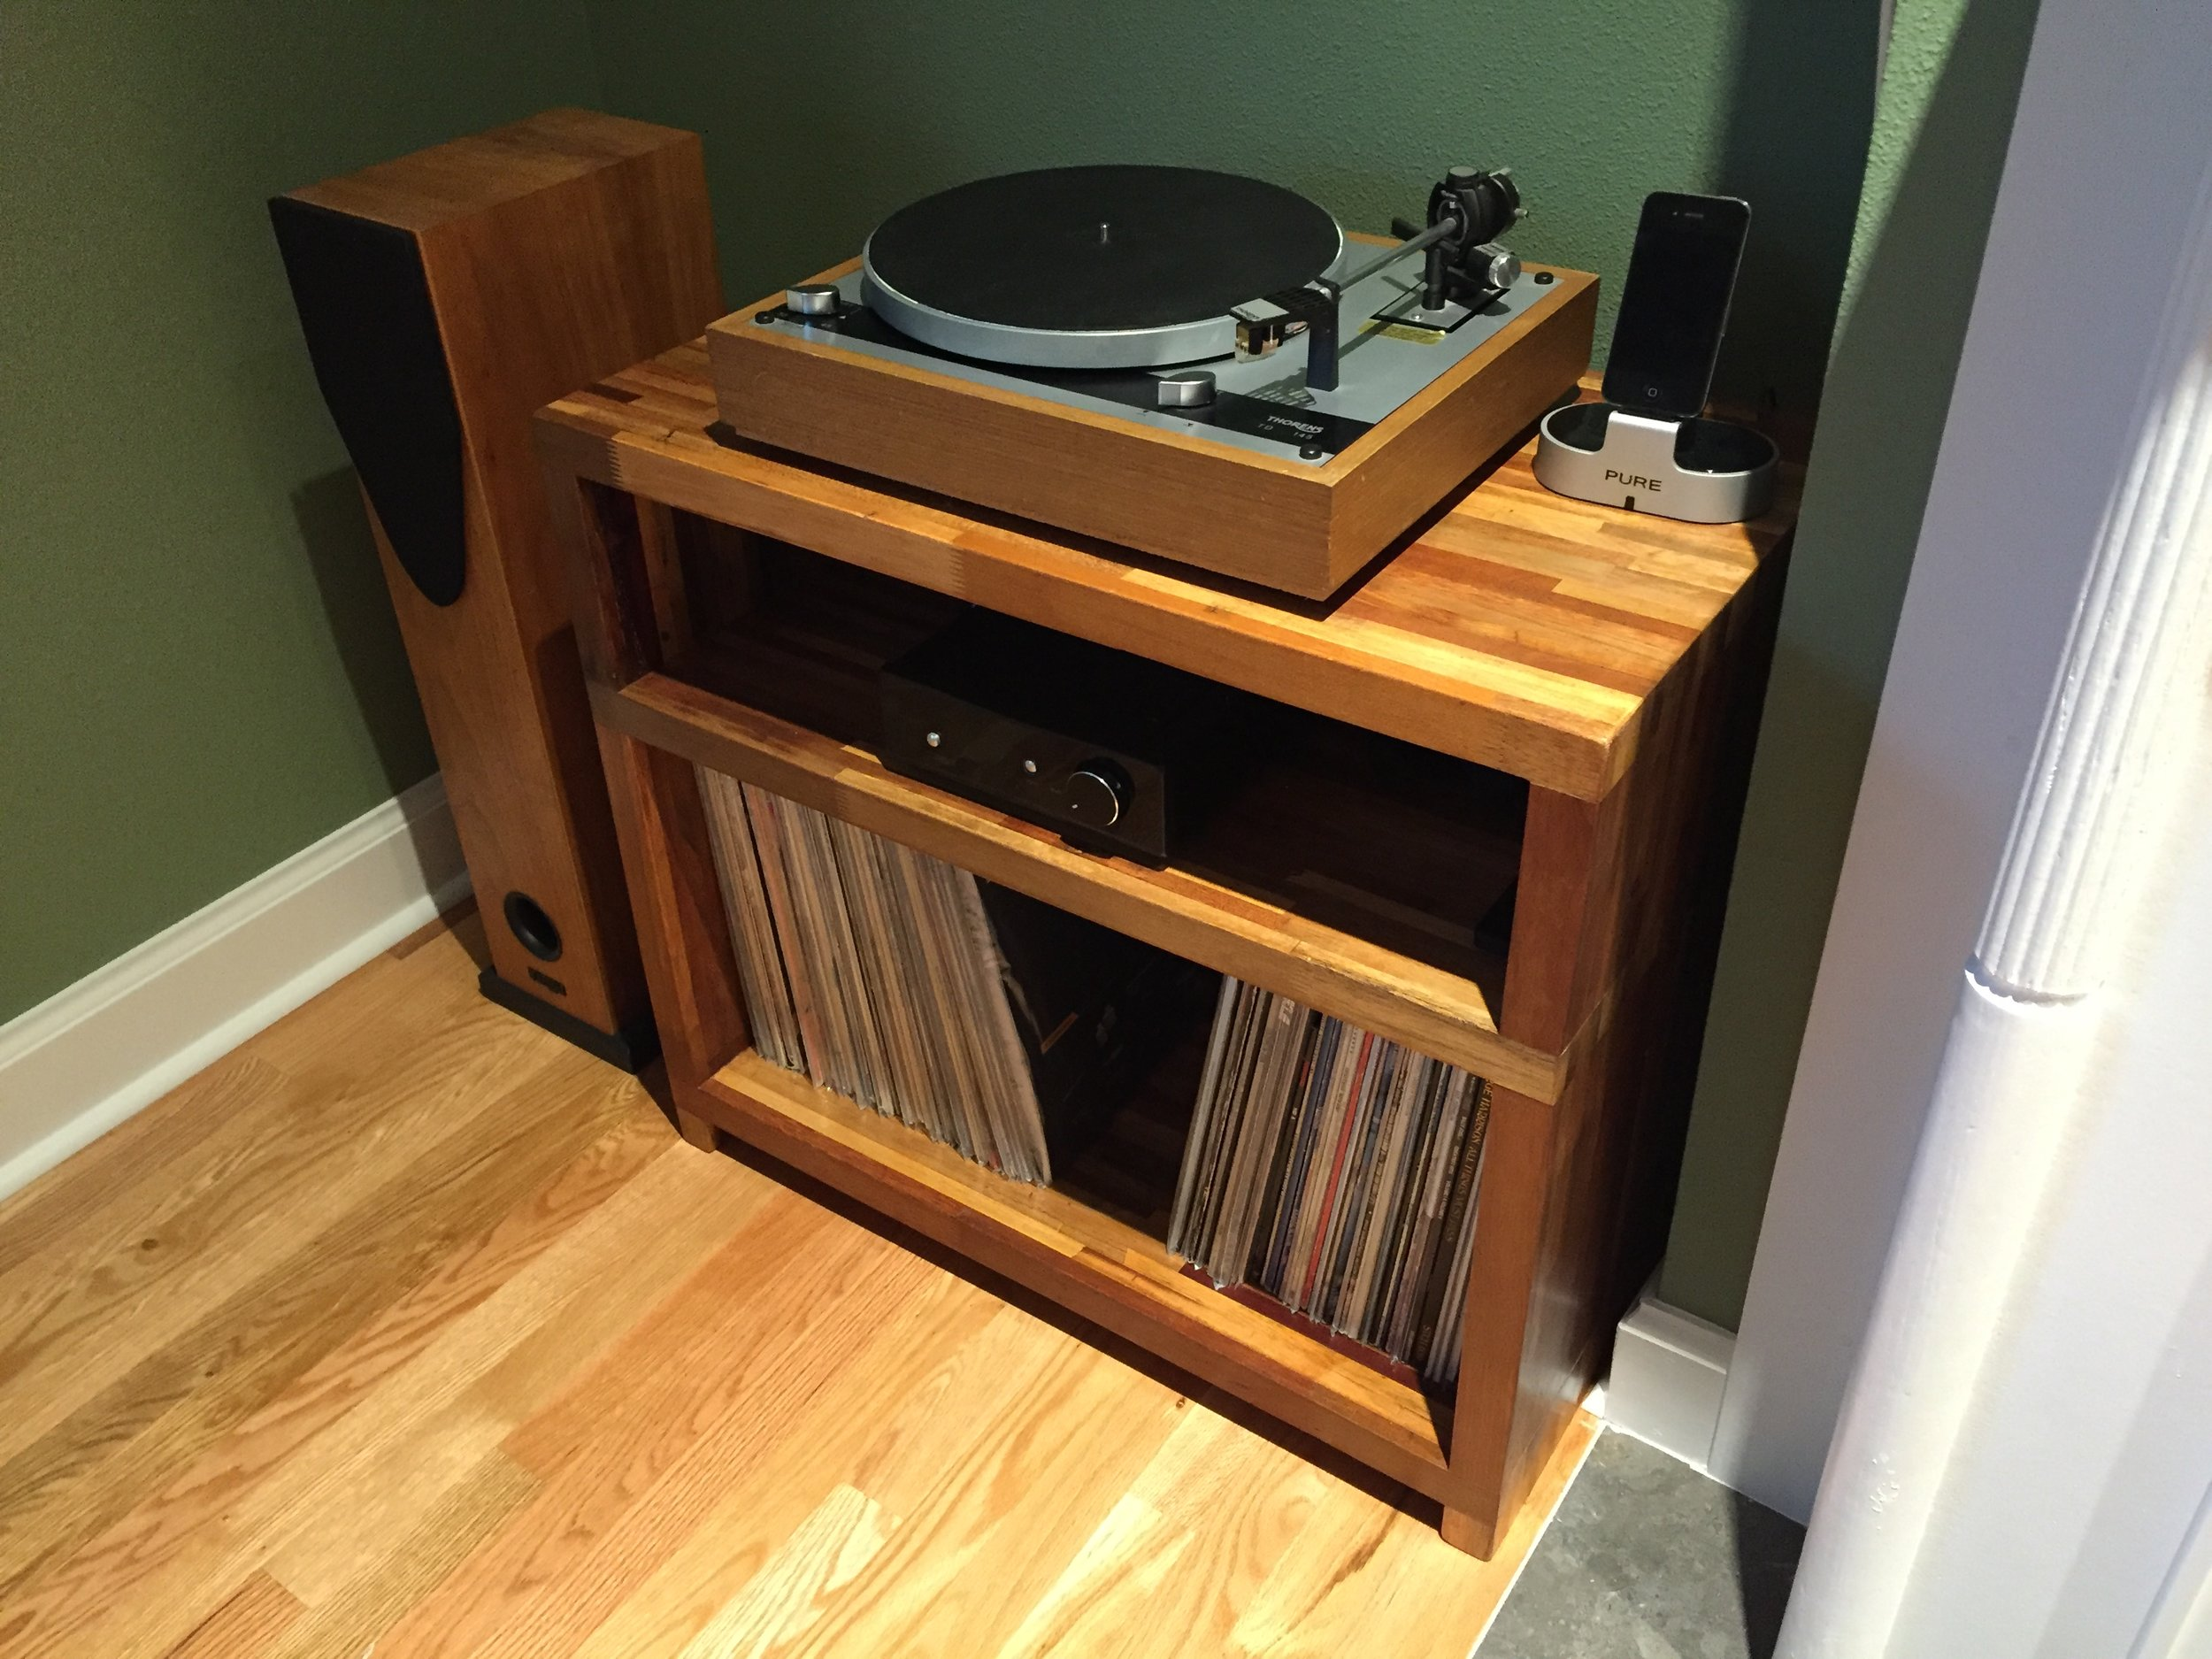 Josh E System:  Rega Brio R, Thorens 145, Rega RS1 speakers, custom GHA mahogany table.